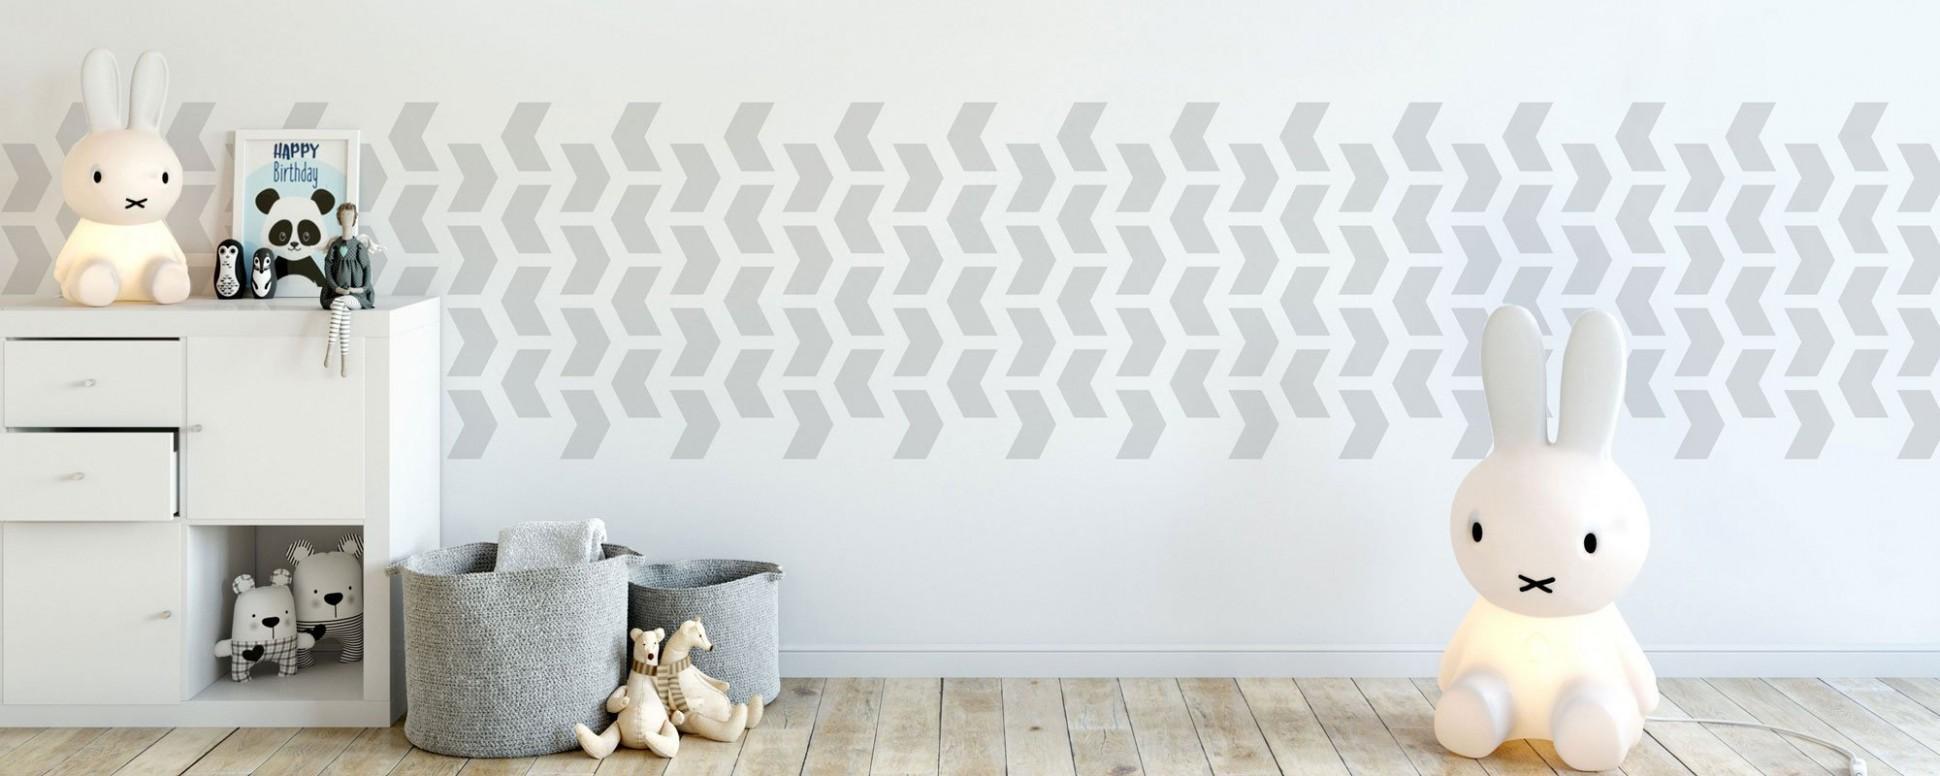 Nursery Stencils for walls and kids room stencils – The Stencil Studio - Baby Room Stencils